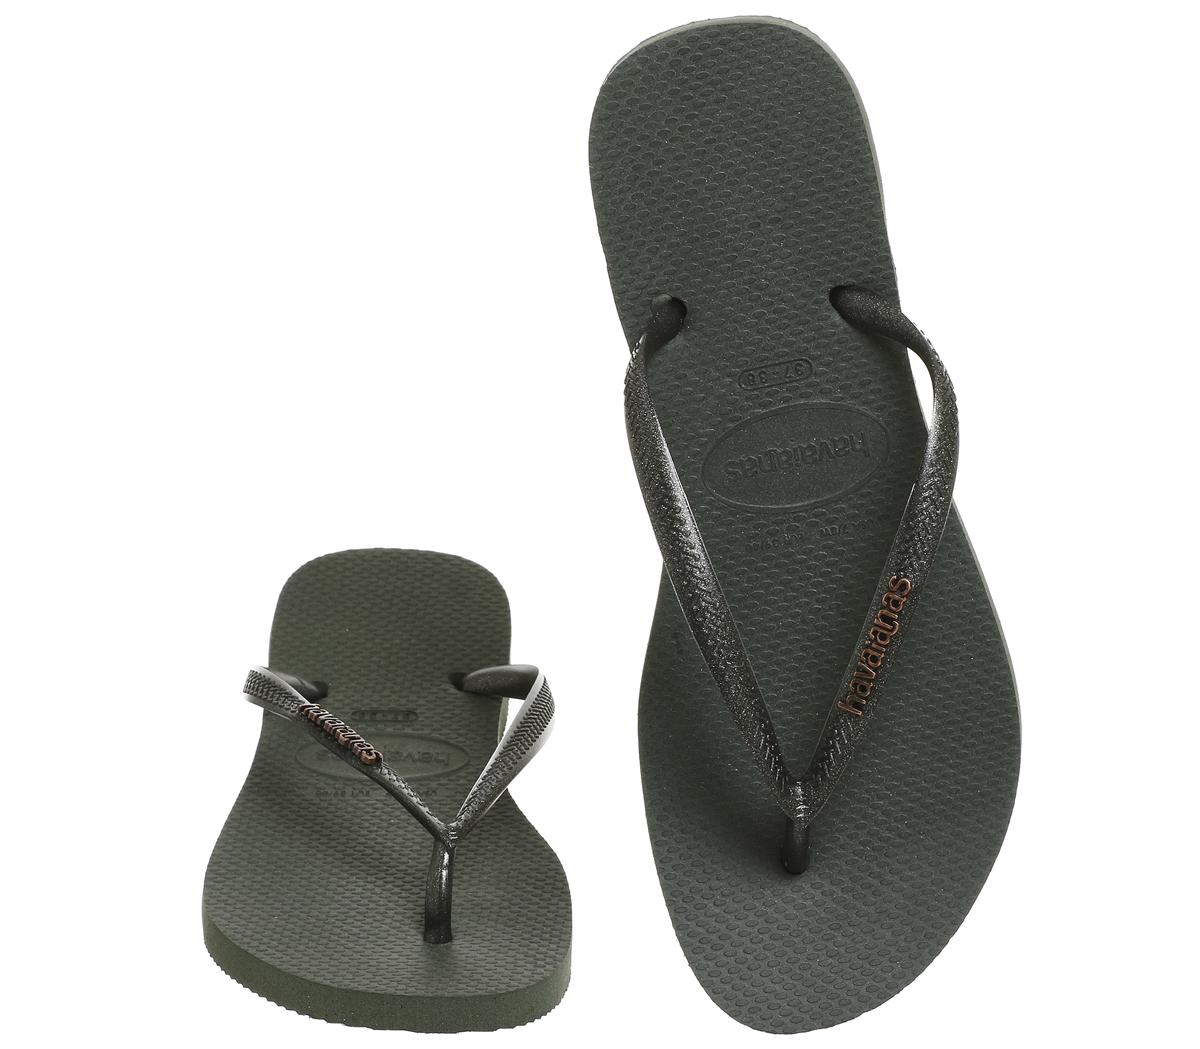 e8c670c02 Womens Havaianas Slim Logo Metallic Flip Flops GREEN OLIVE Sandals ...